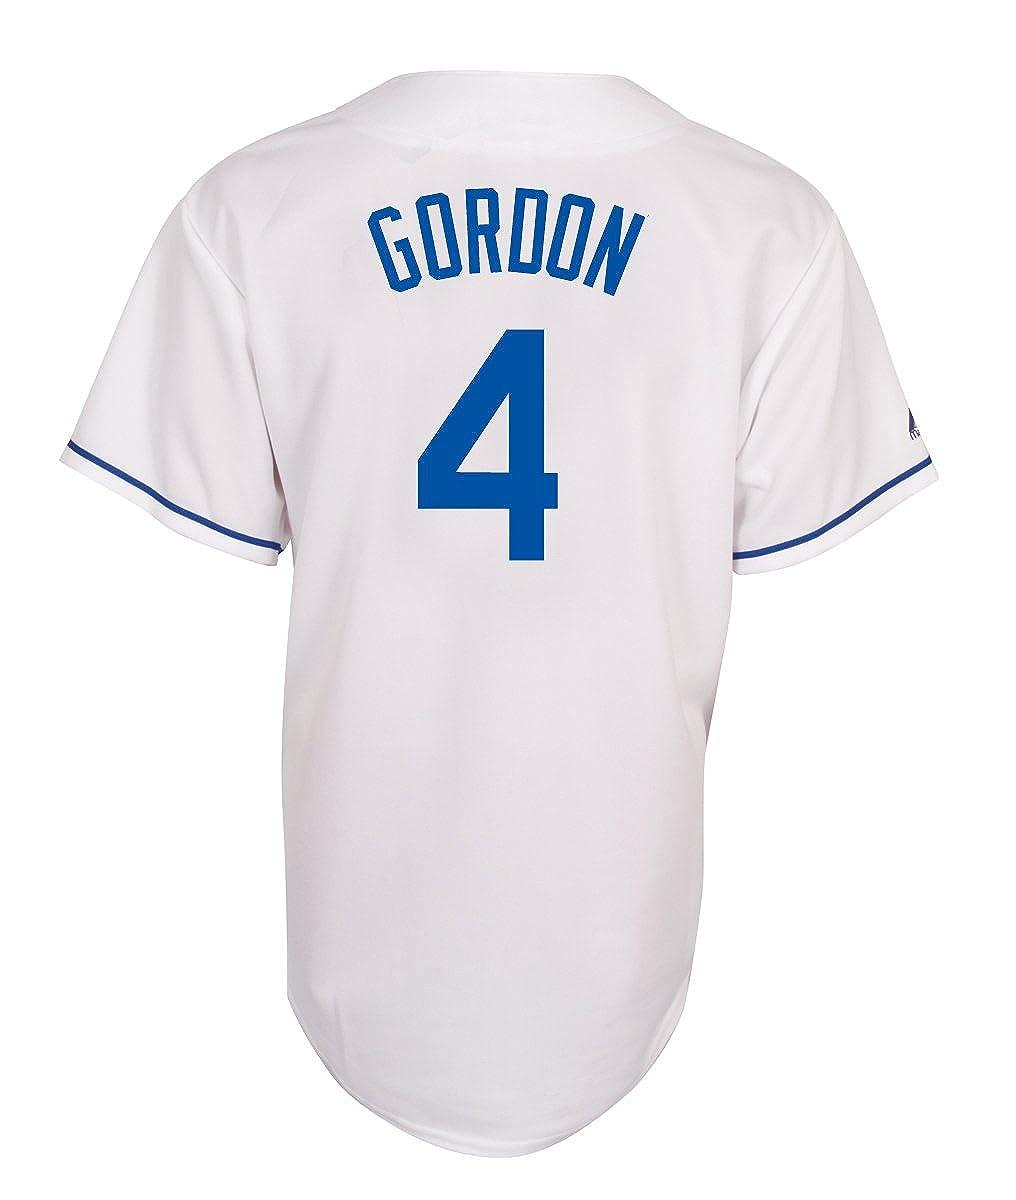 size 40 d6024 dca5c Amazon.com : MLB Alex Gordon Kansas City Royals Youth ...